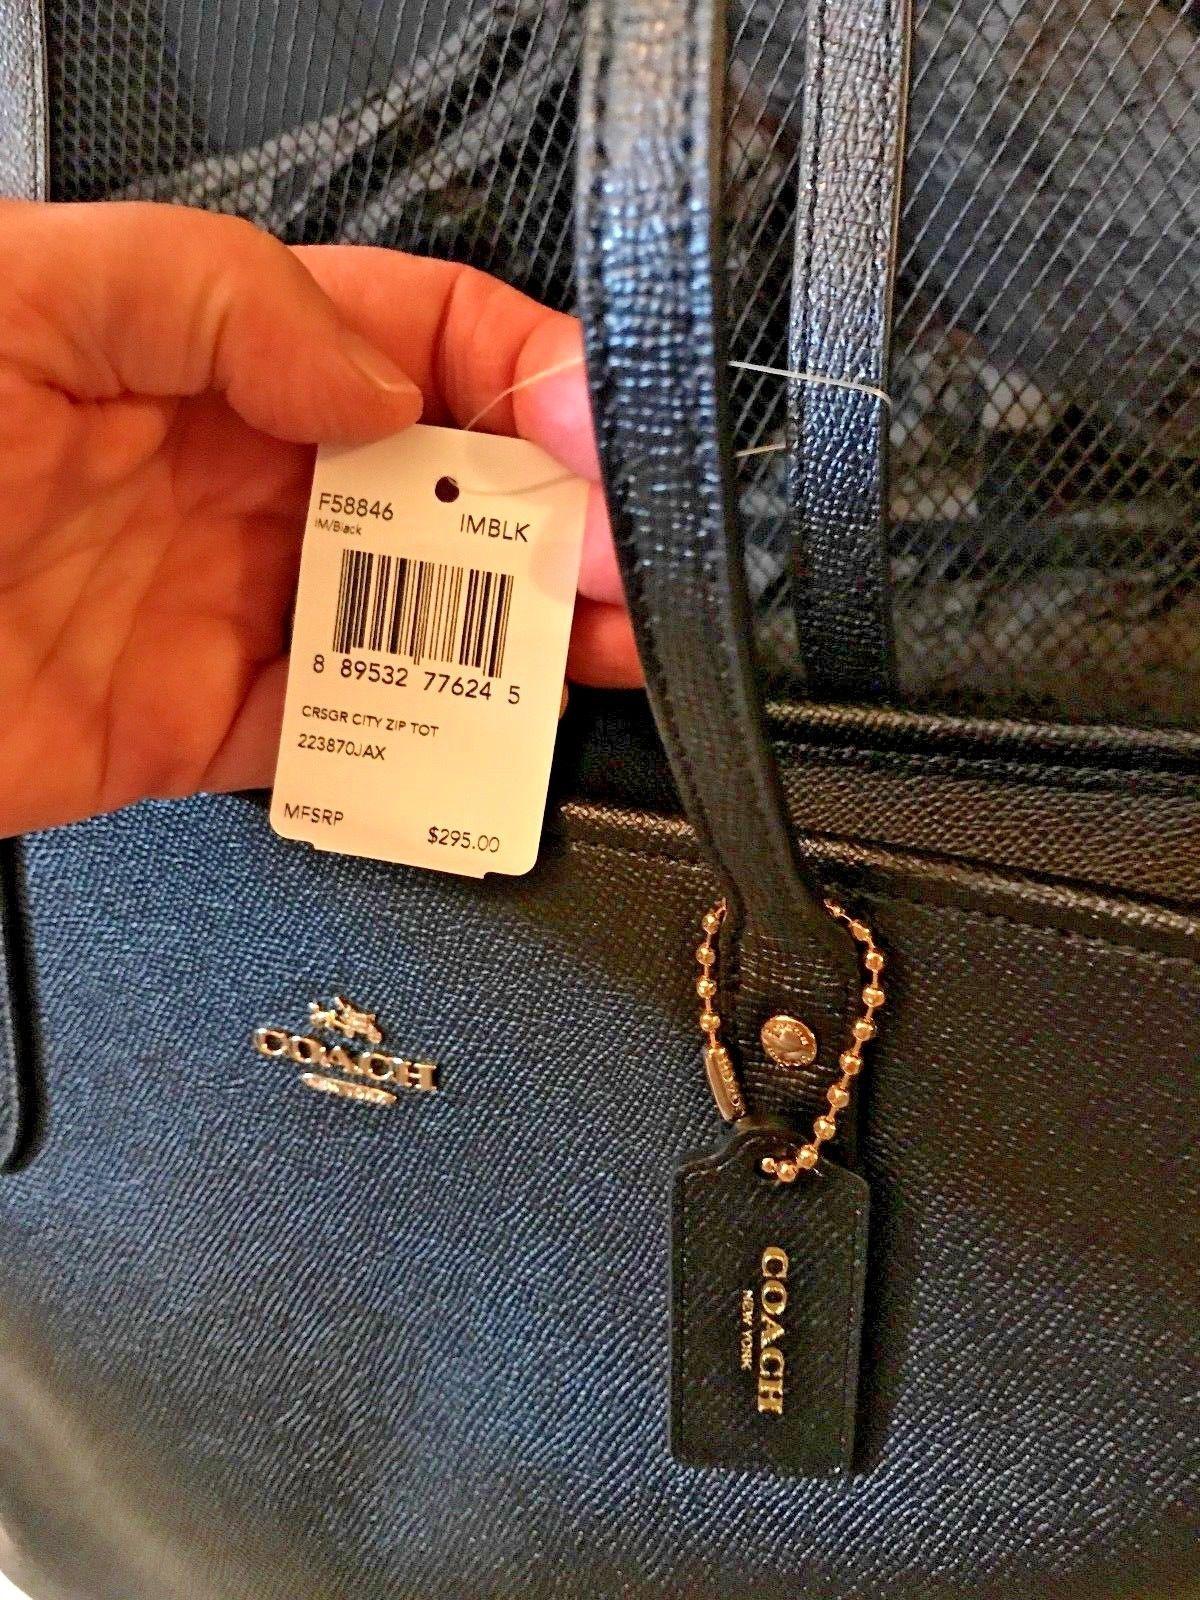 9a4960becbd0 NWT  2232 Coach 58846 City Zip Tote Crossgrain Leather handbag Black  115.0